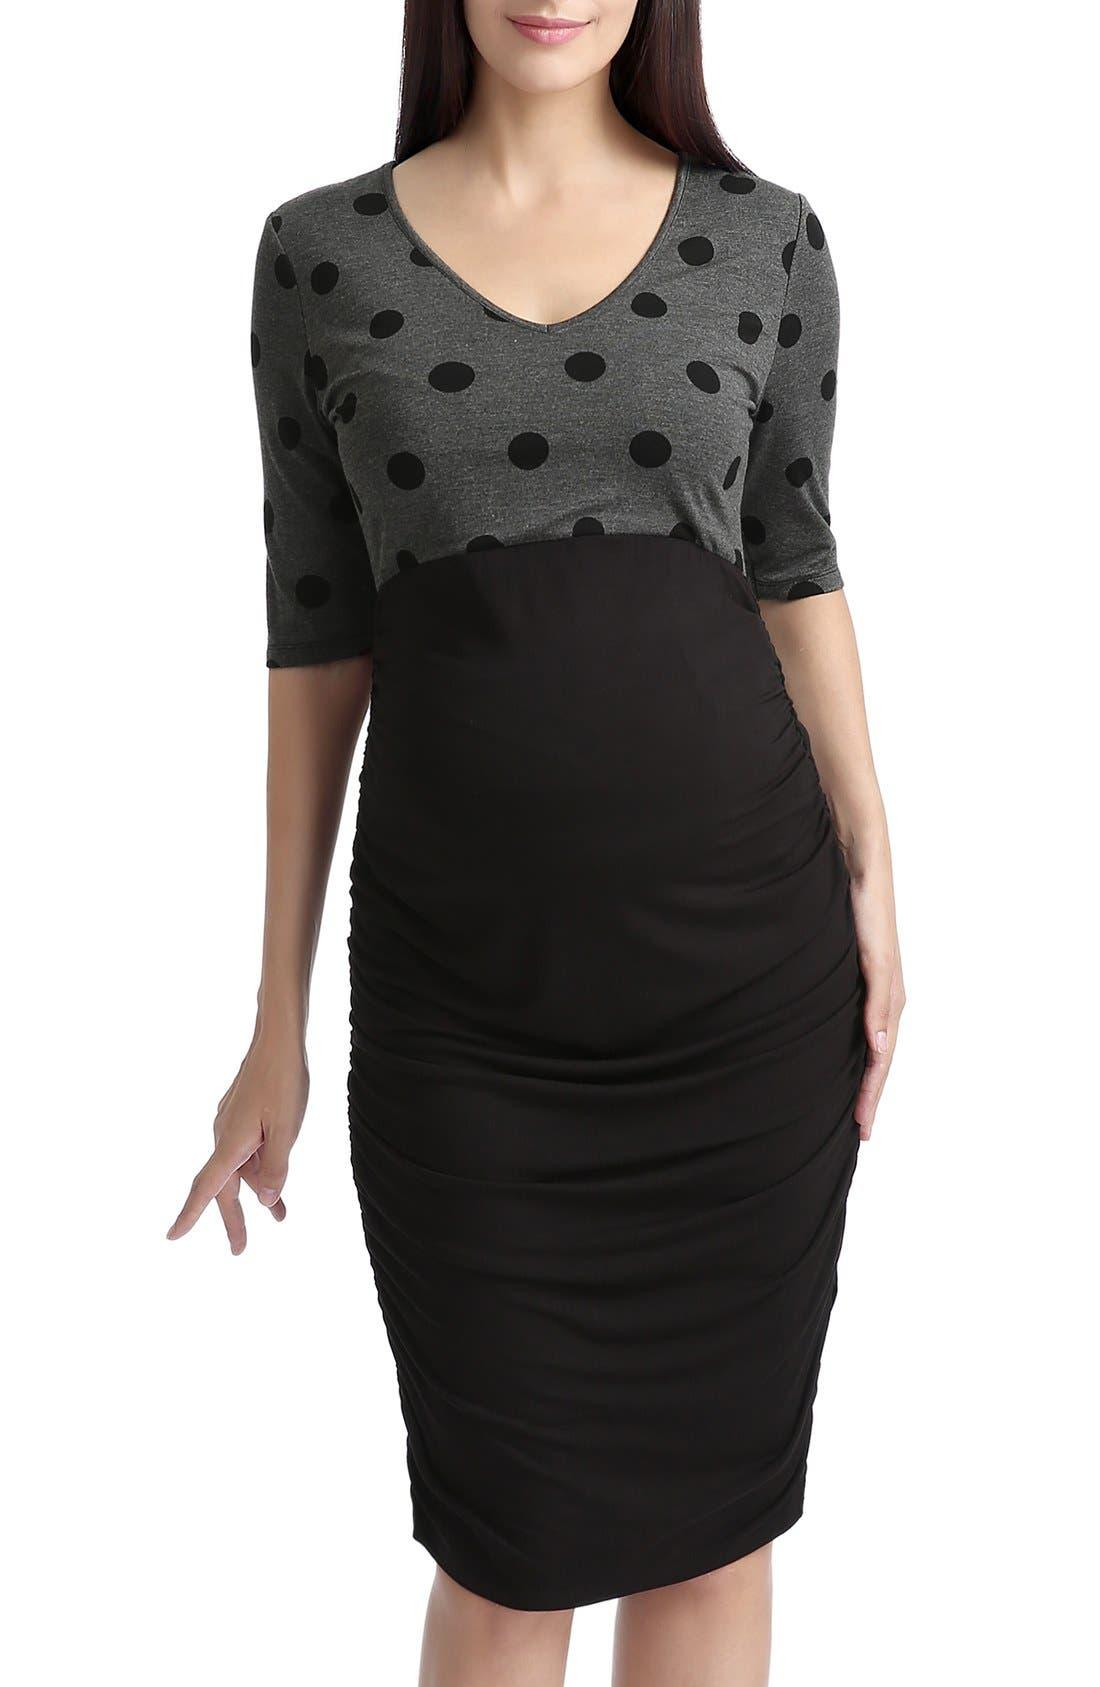 'Farrah' Maternity Body-Con Dress,                         Main,                         color, Black/ Gray